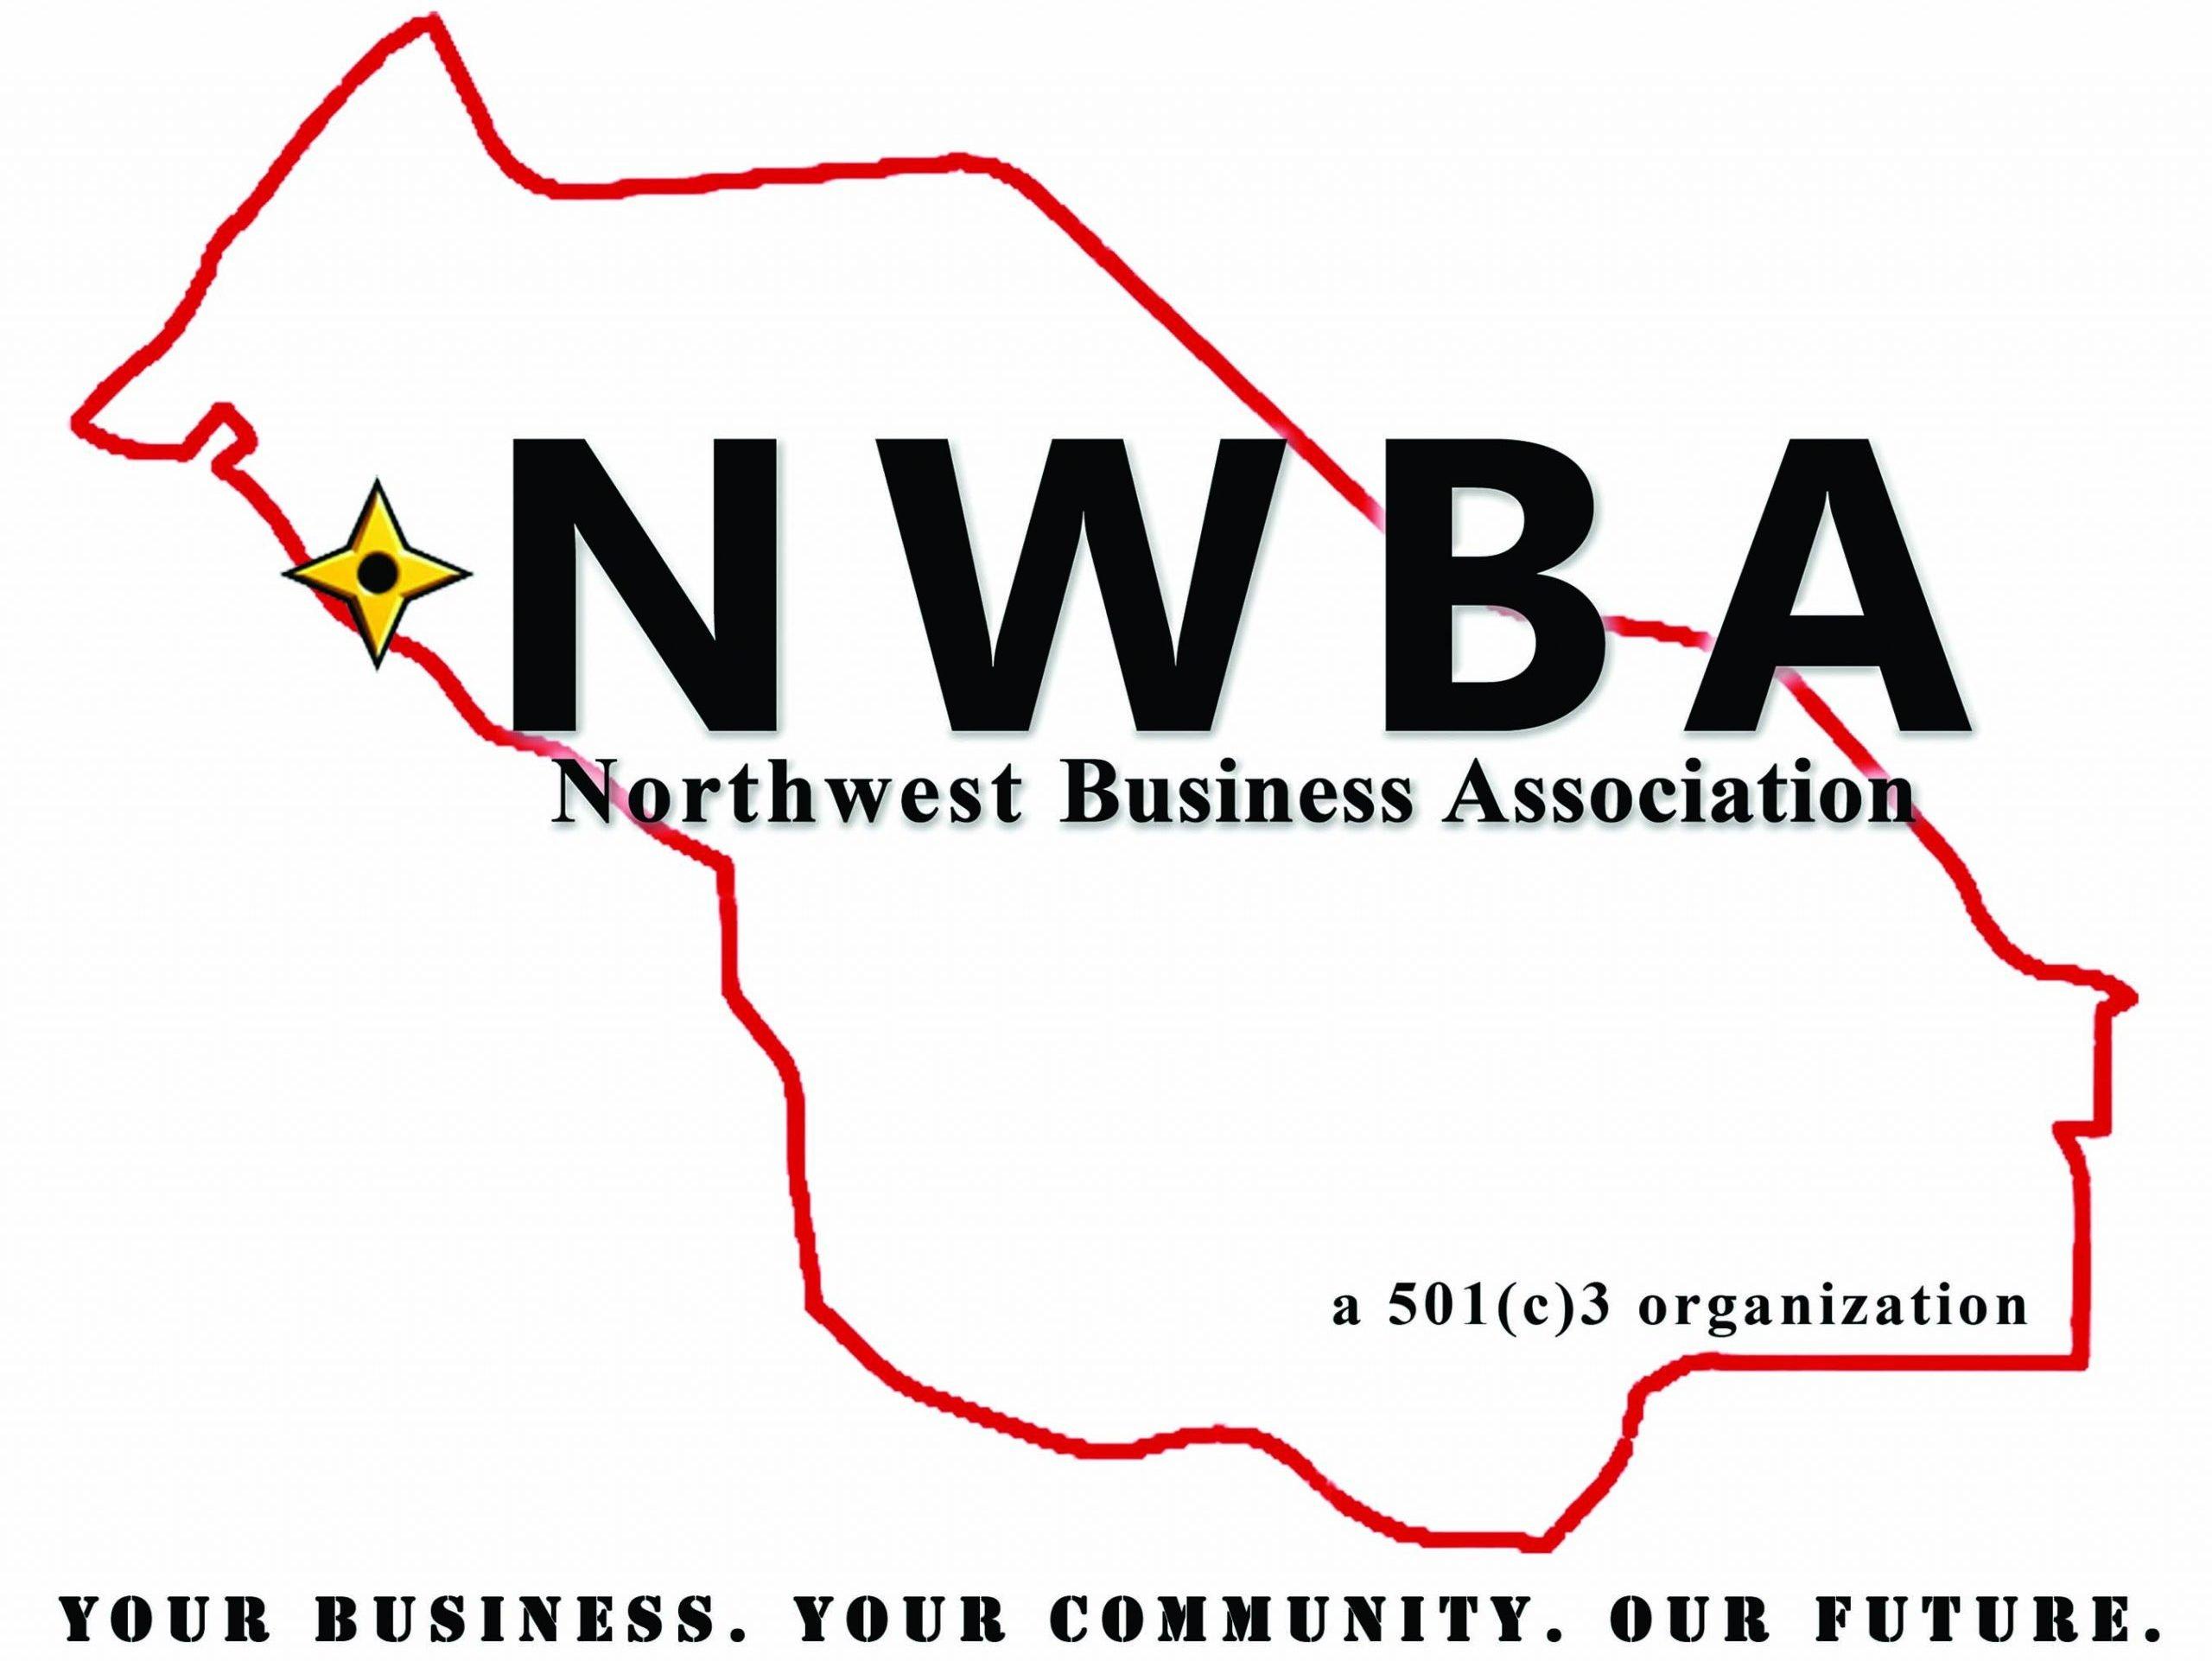 Northwest Business Association